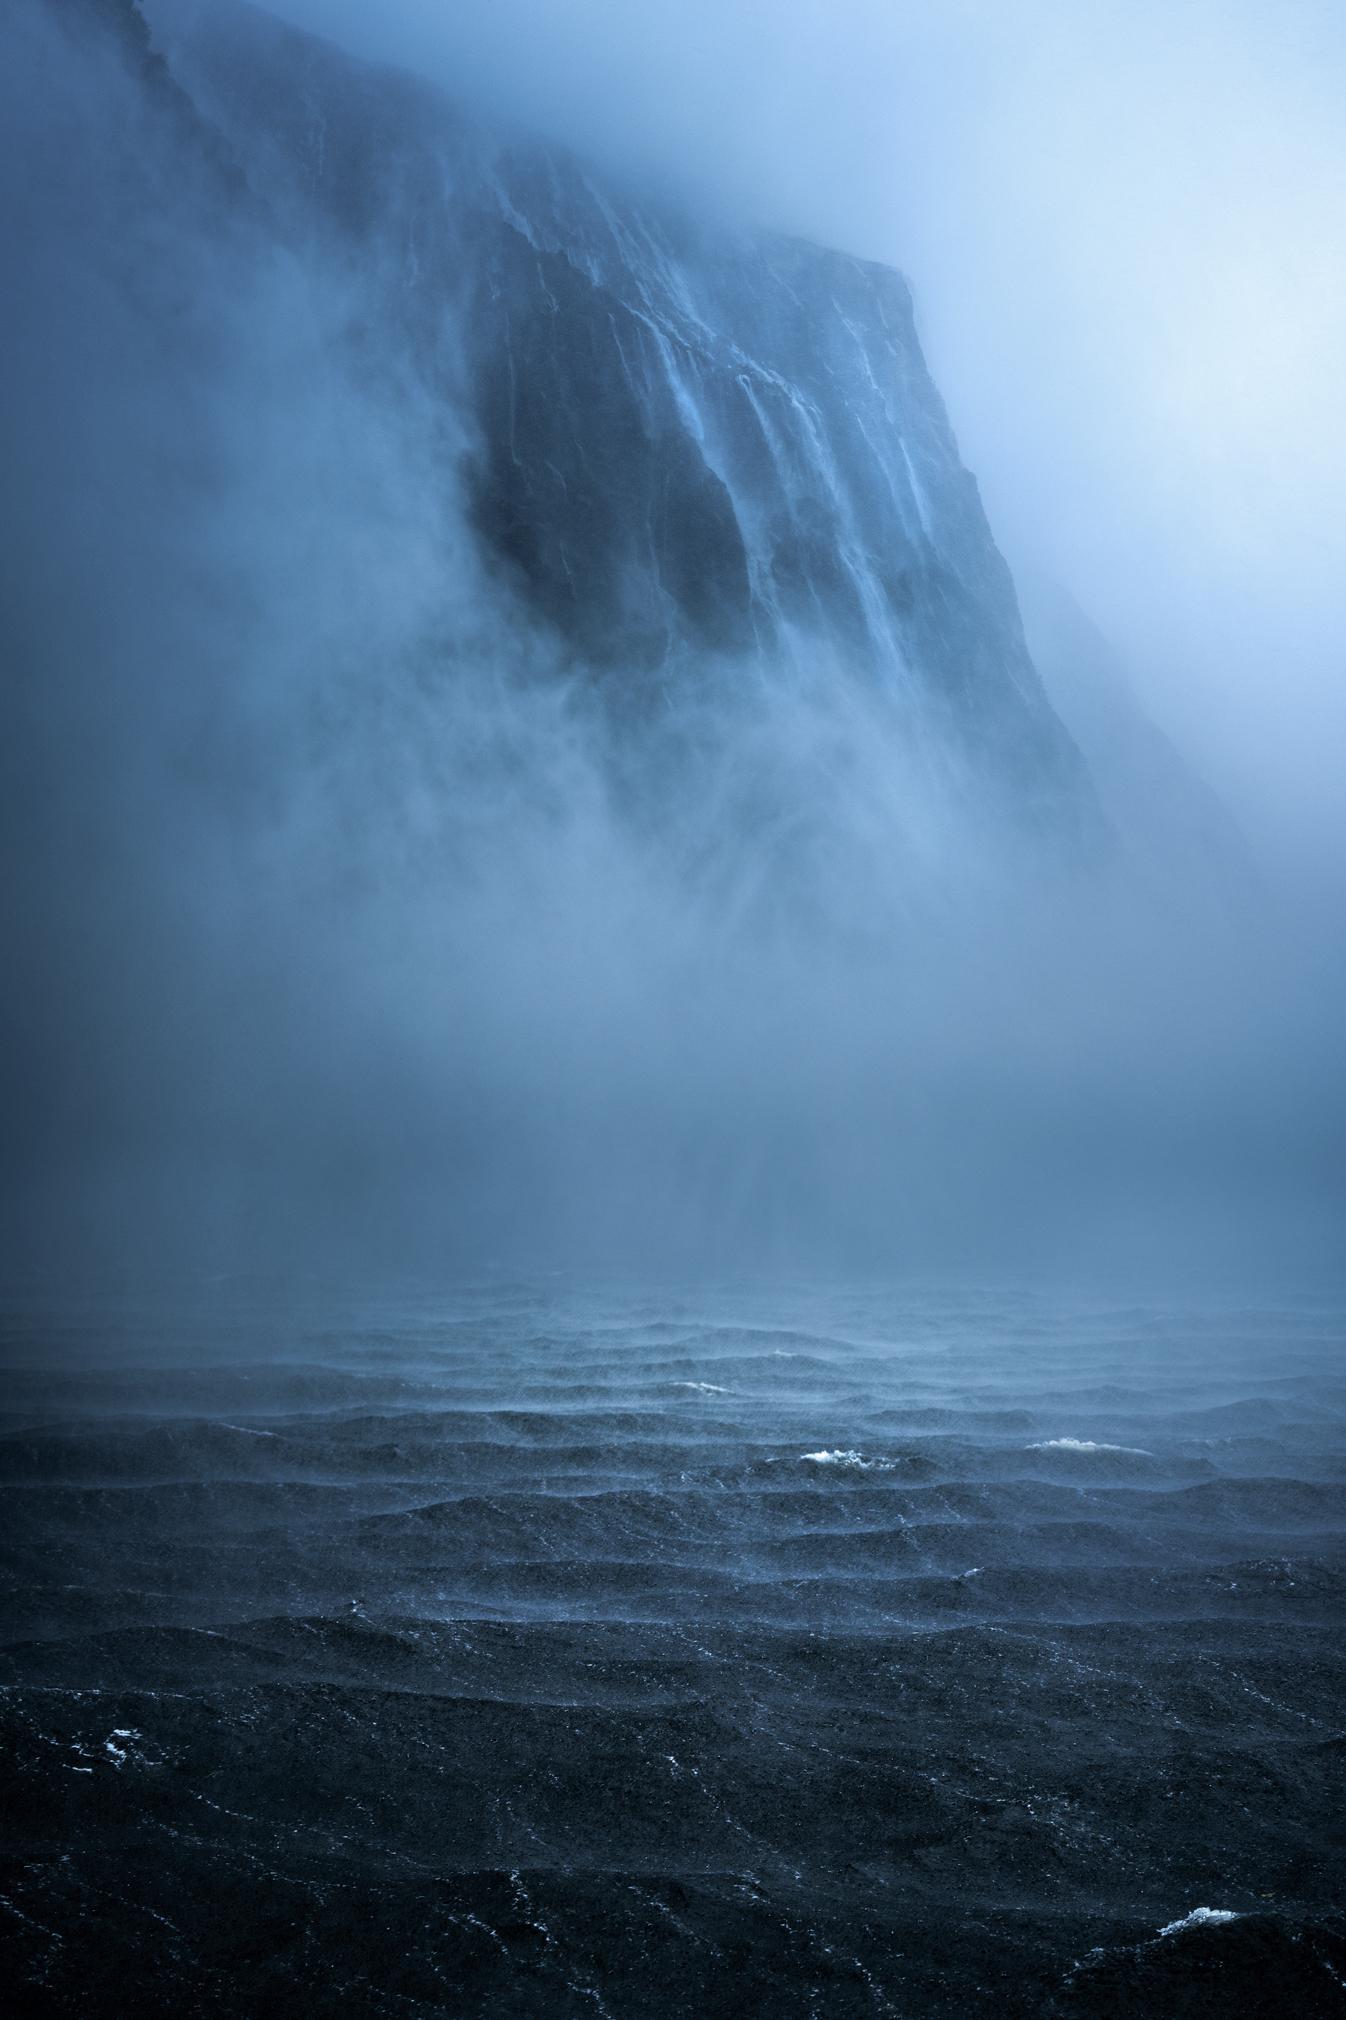 Milford Sound Waterfalls Copyright William Patino